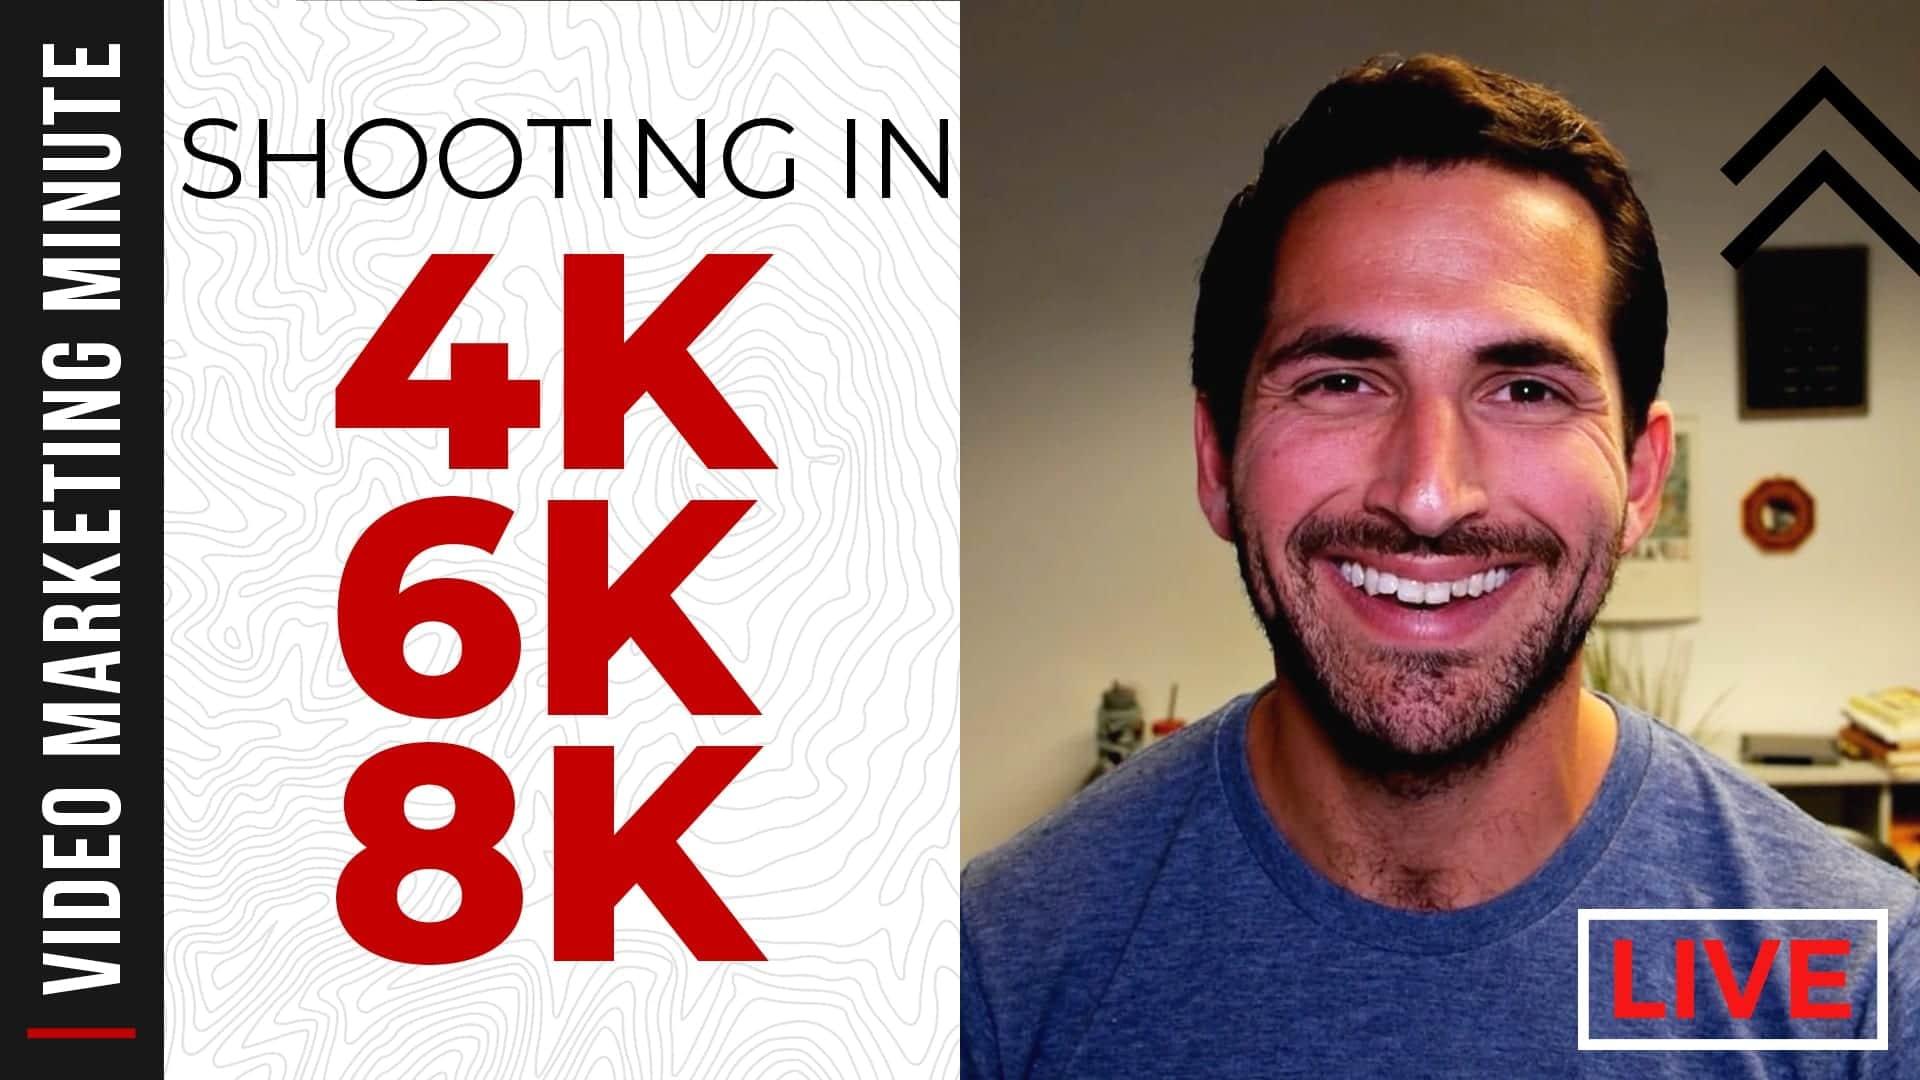 Shooting video in 4K, 6K, 8K